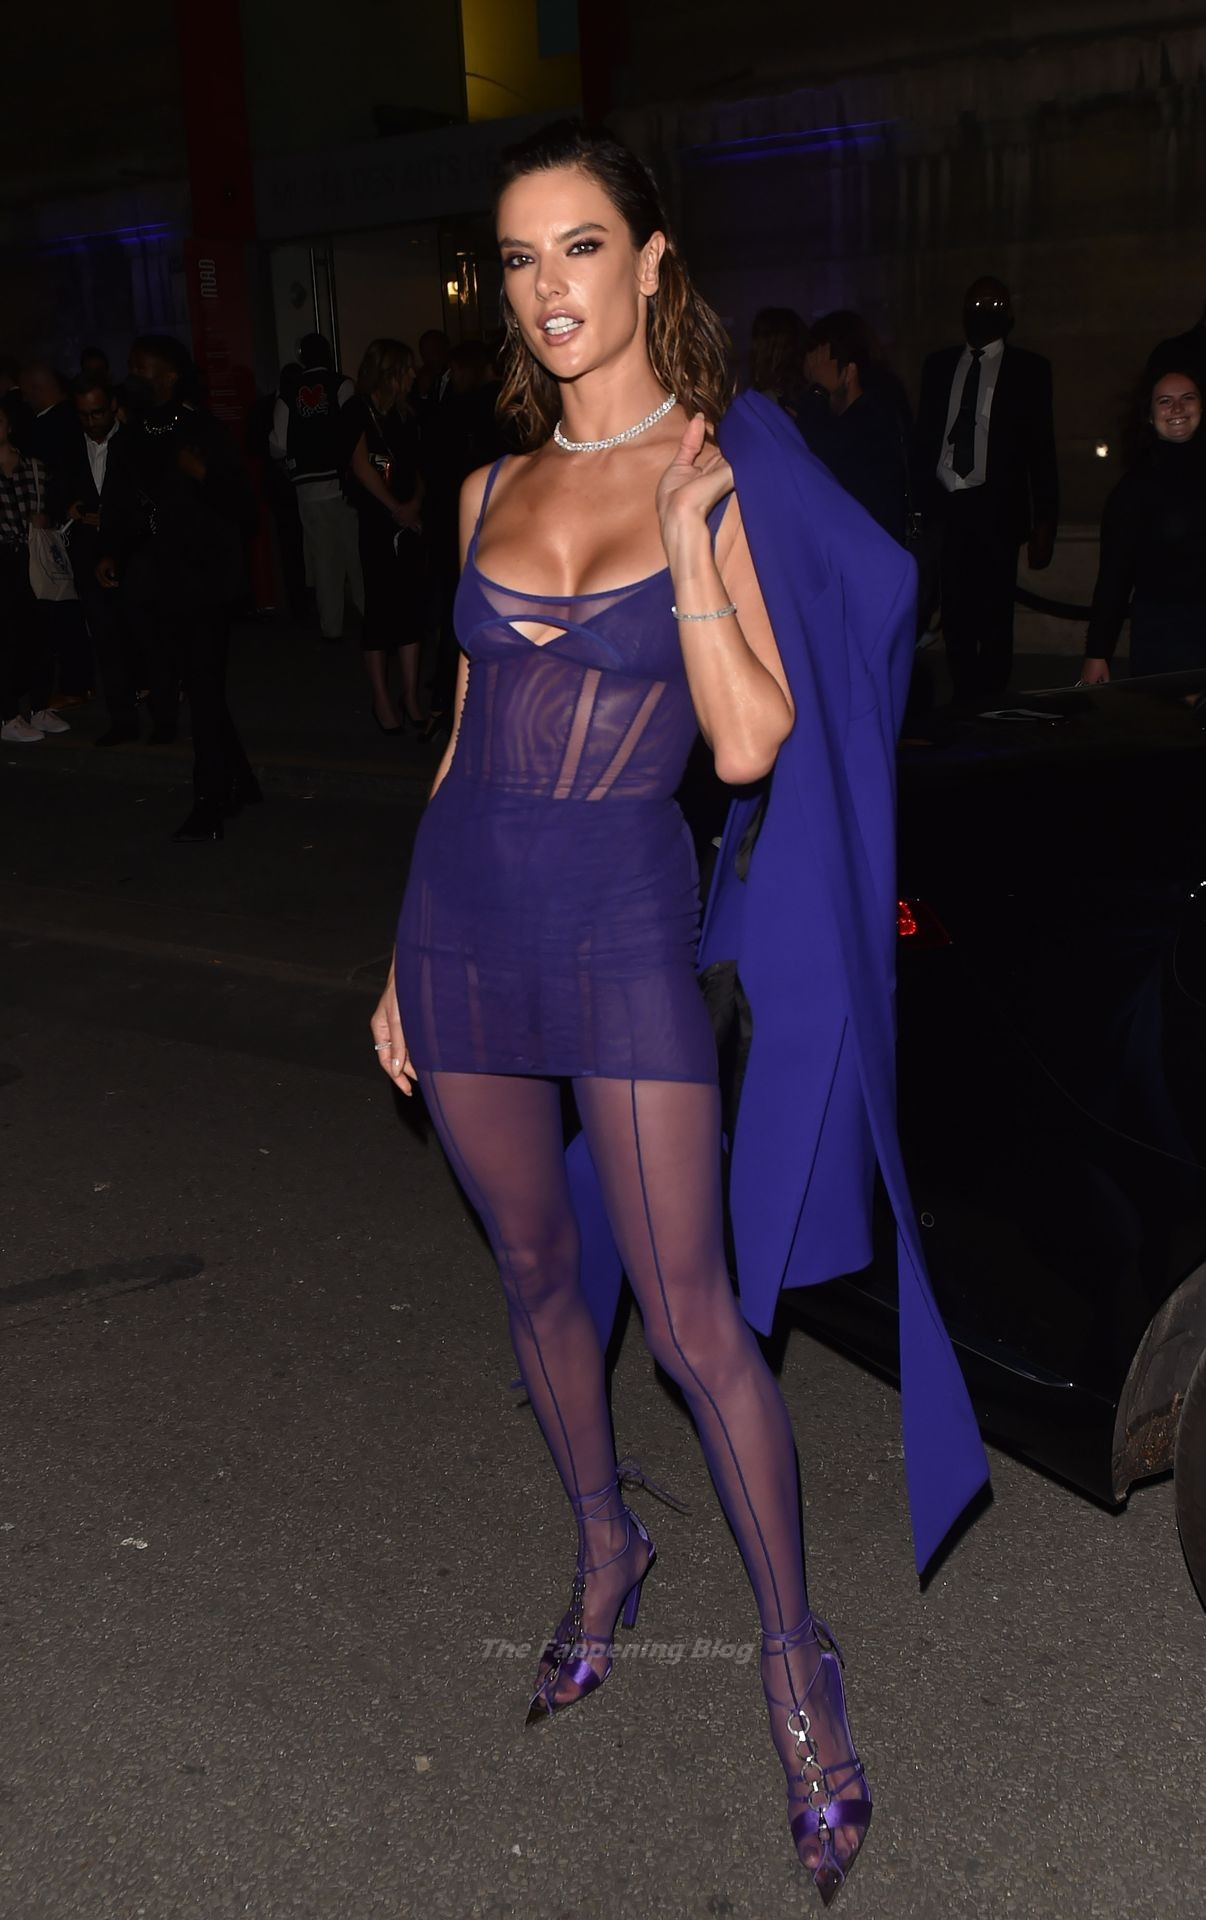 Alessandra-Ambrosio-Sexy-The-Fappening-Blog-80-1.jpg